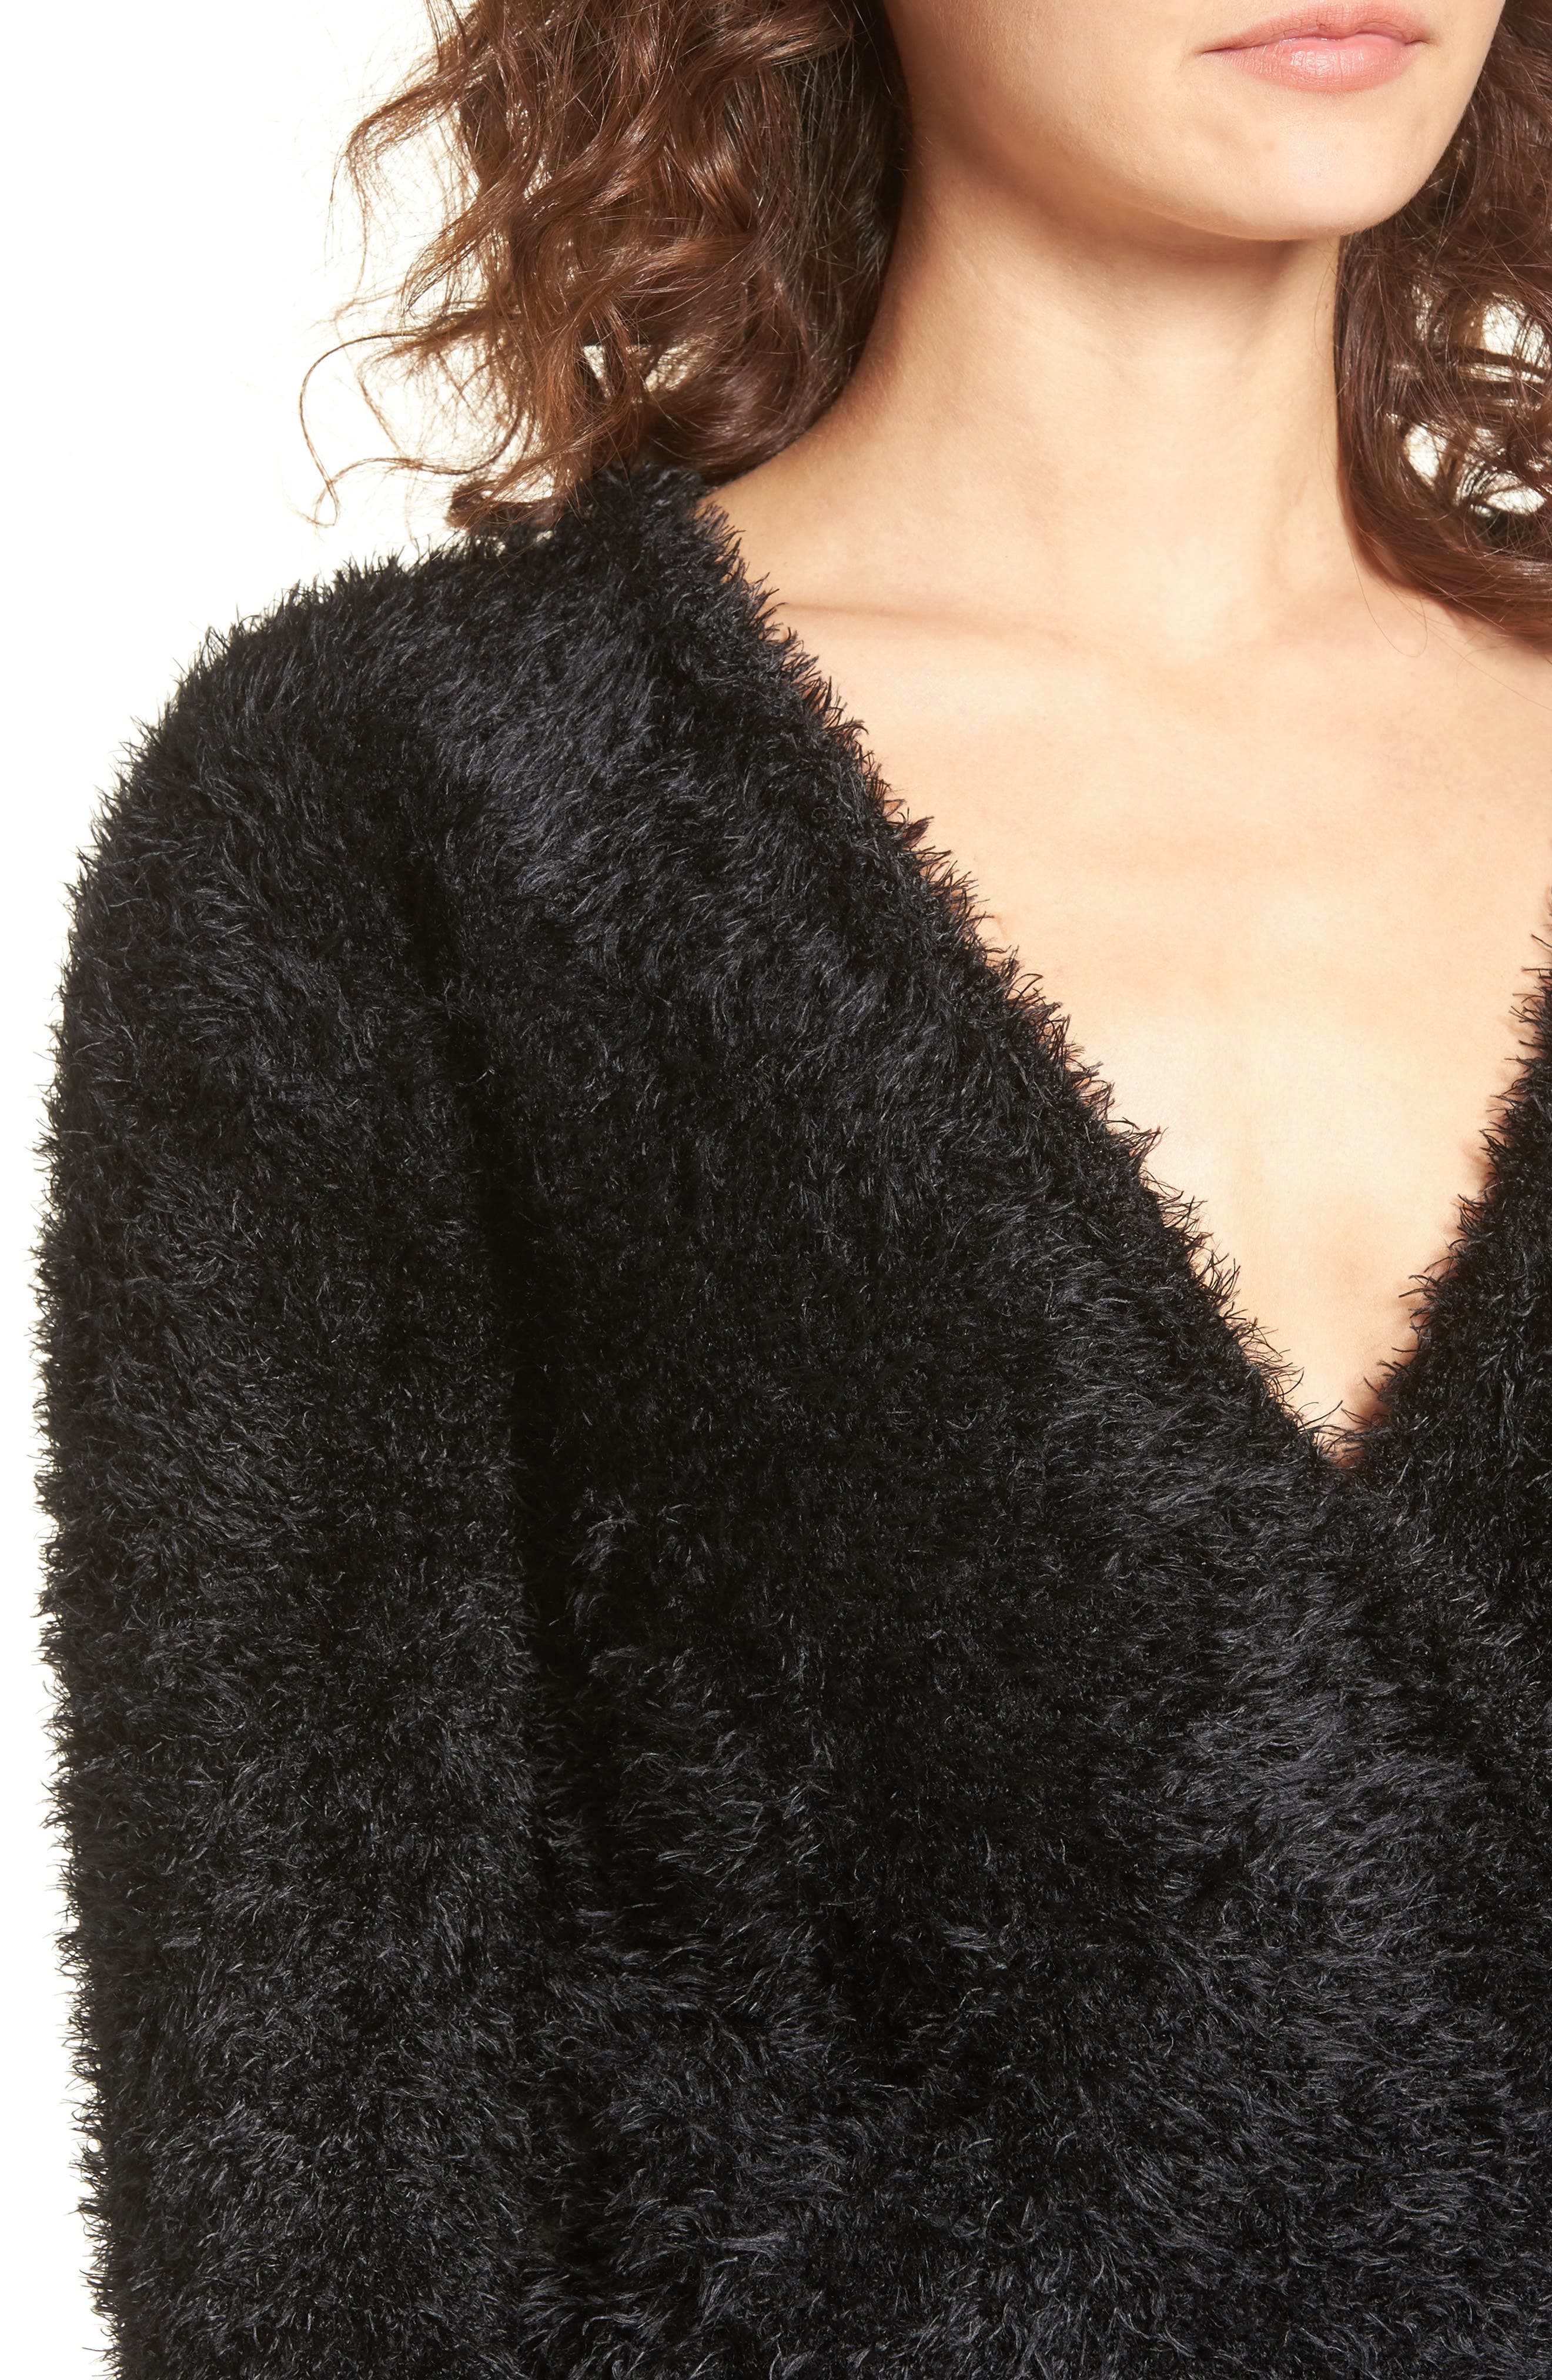 Fuzzy Surplice Sweater,                             Alternate thumbnail 4, color,                             Black